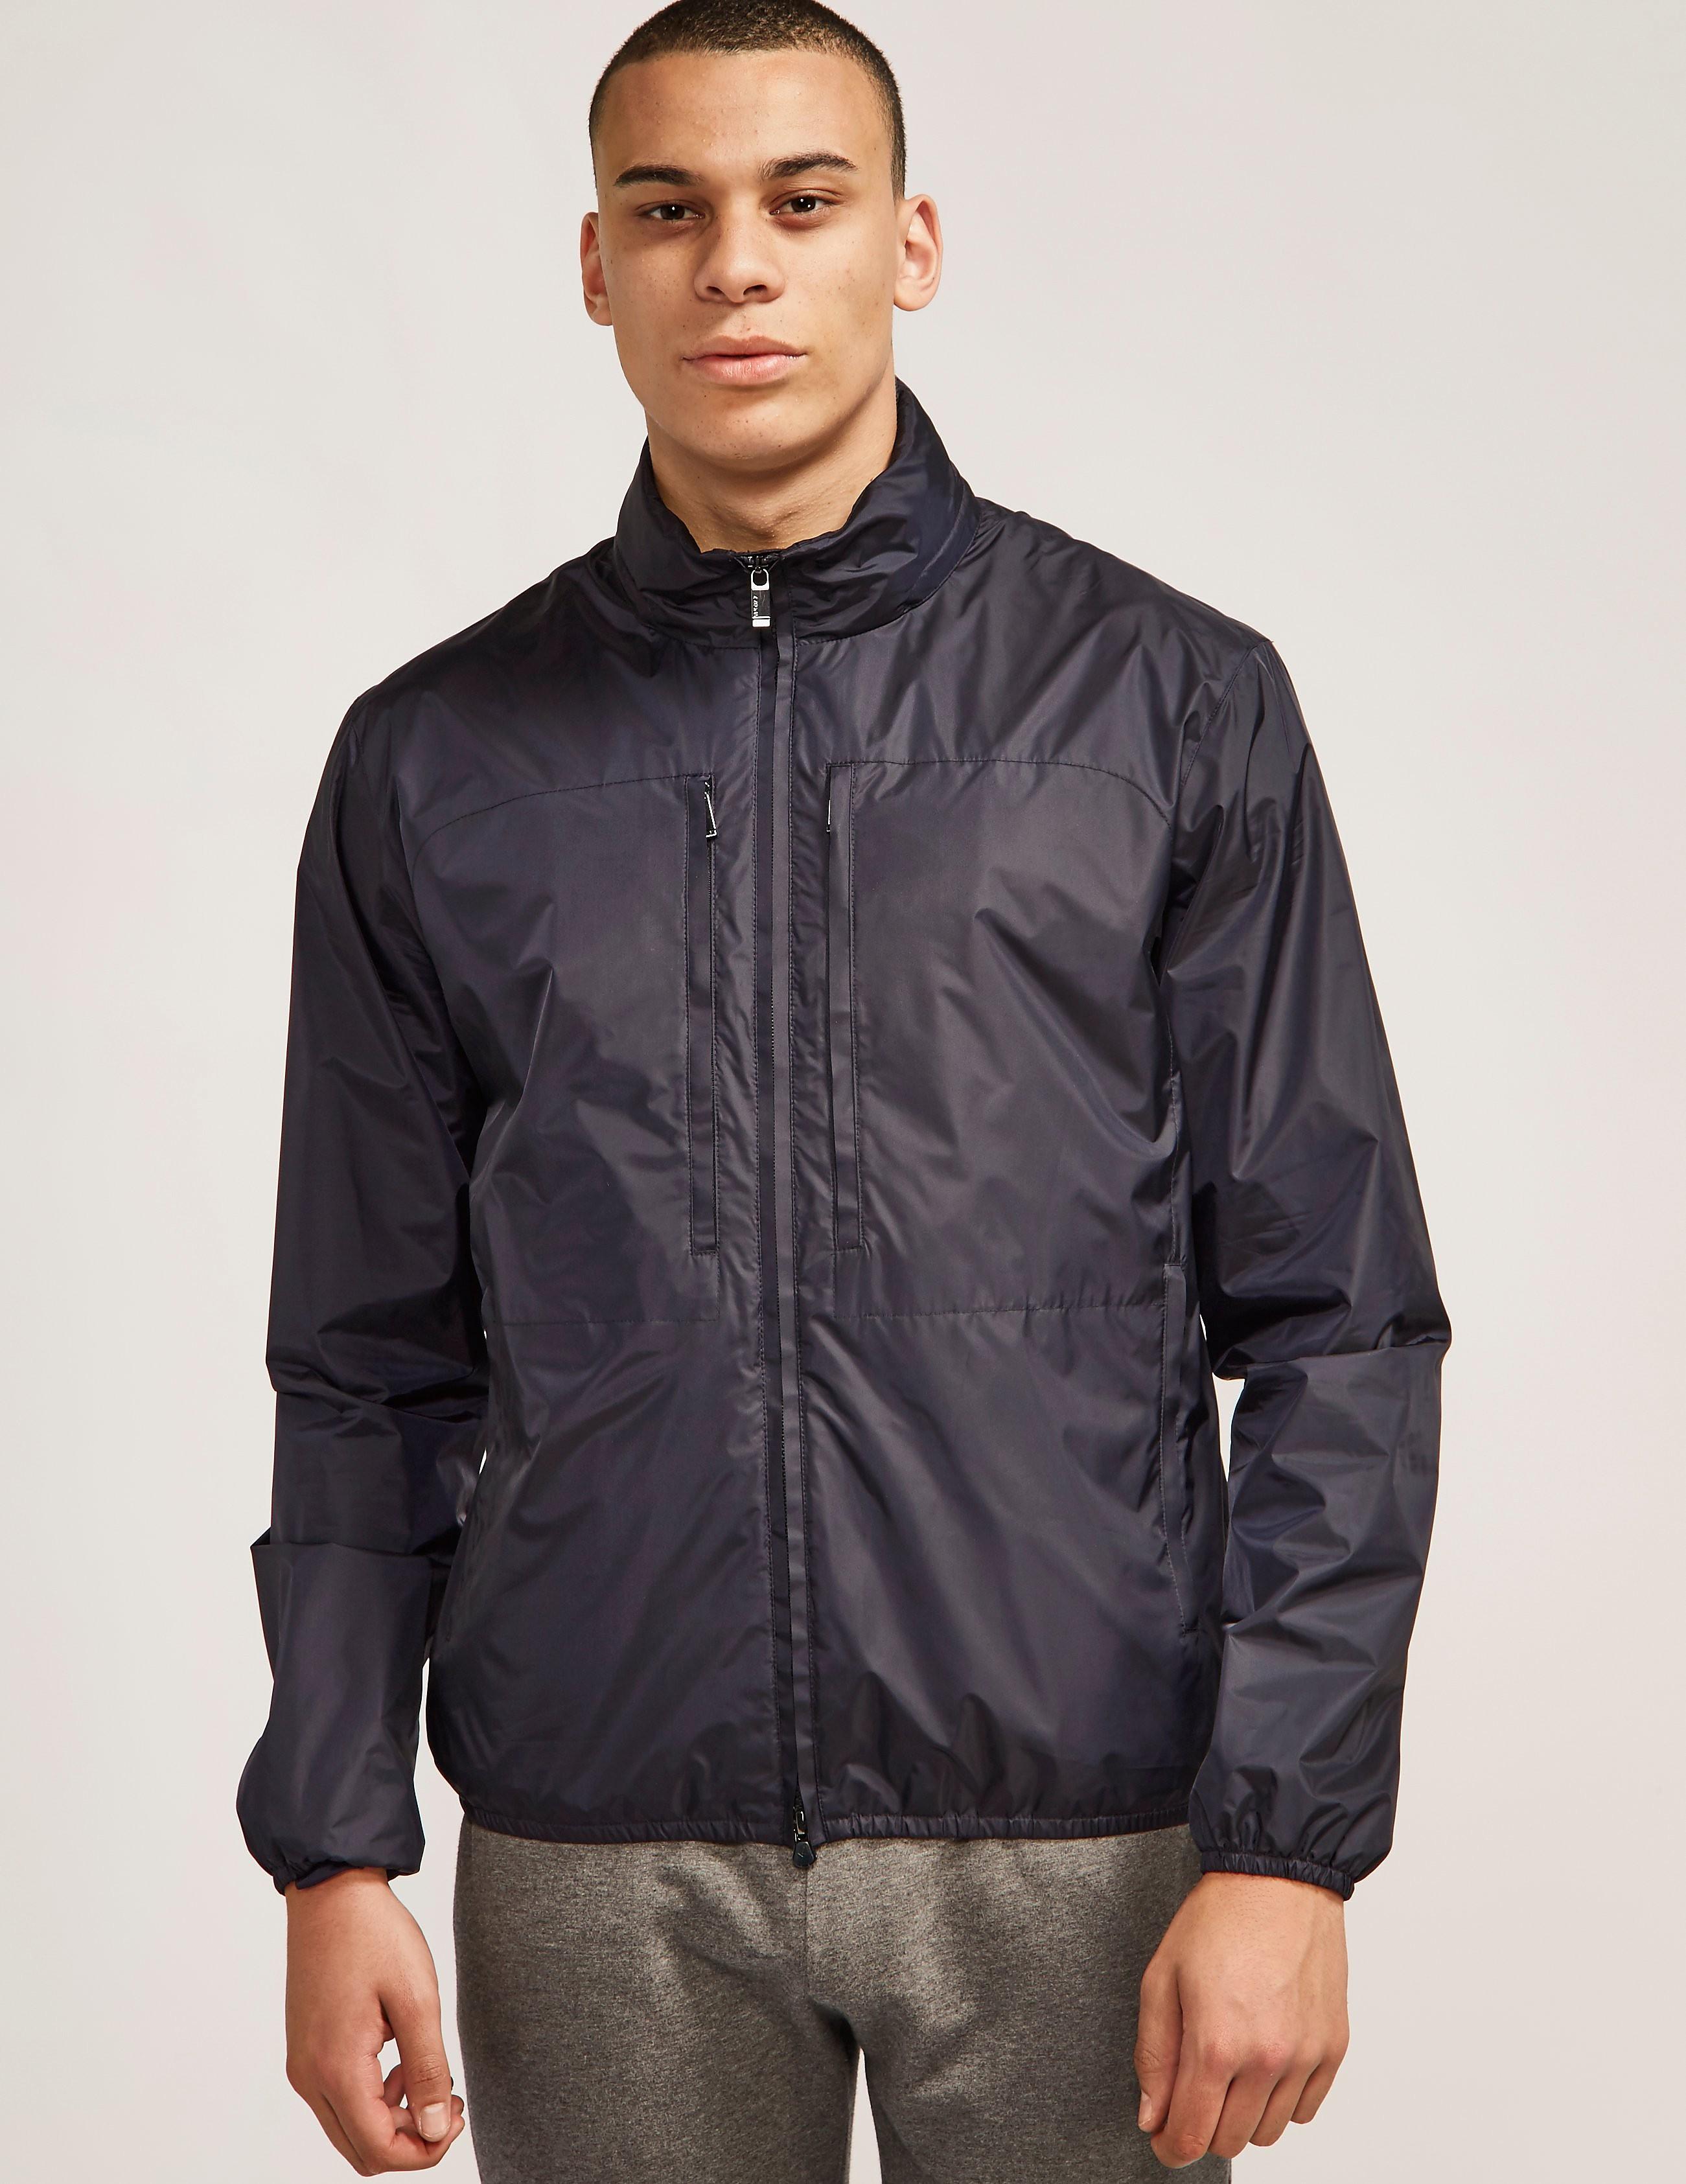 Z Zegna Packable Jacket